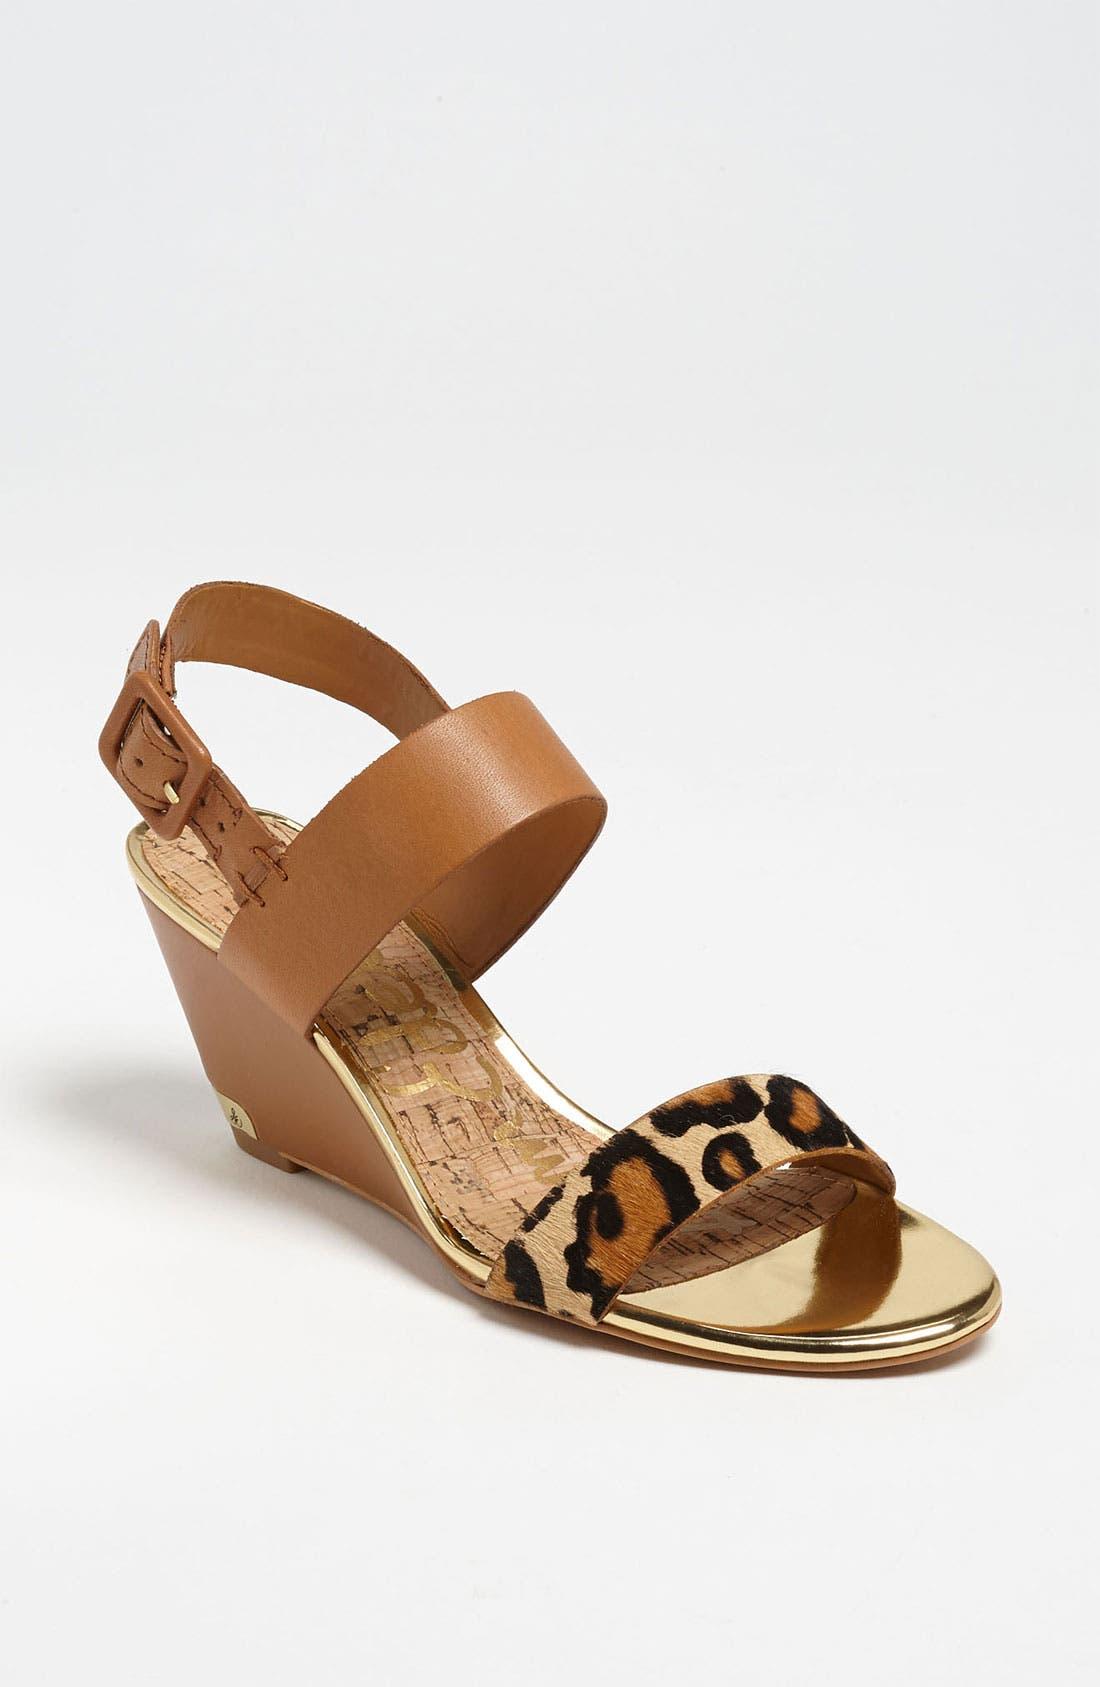 Main Image - Sam Edelman 'Sutton' Sandal